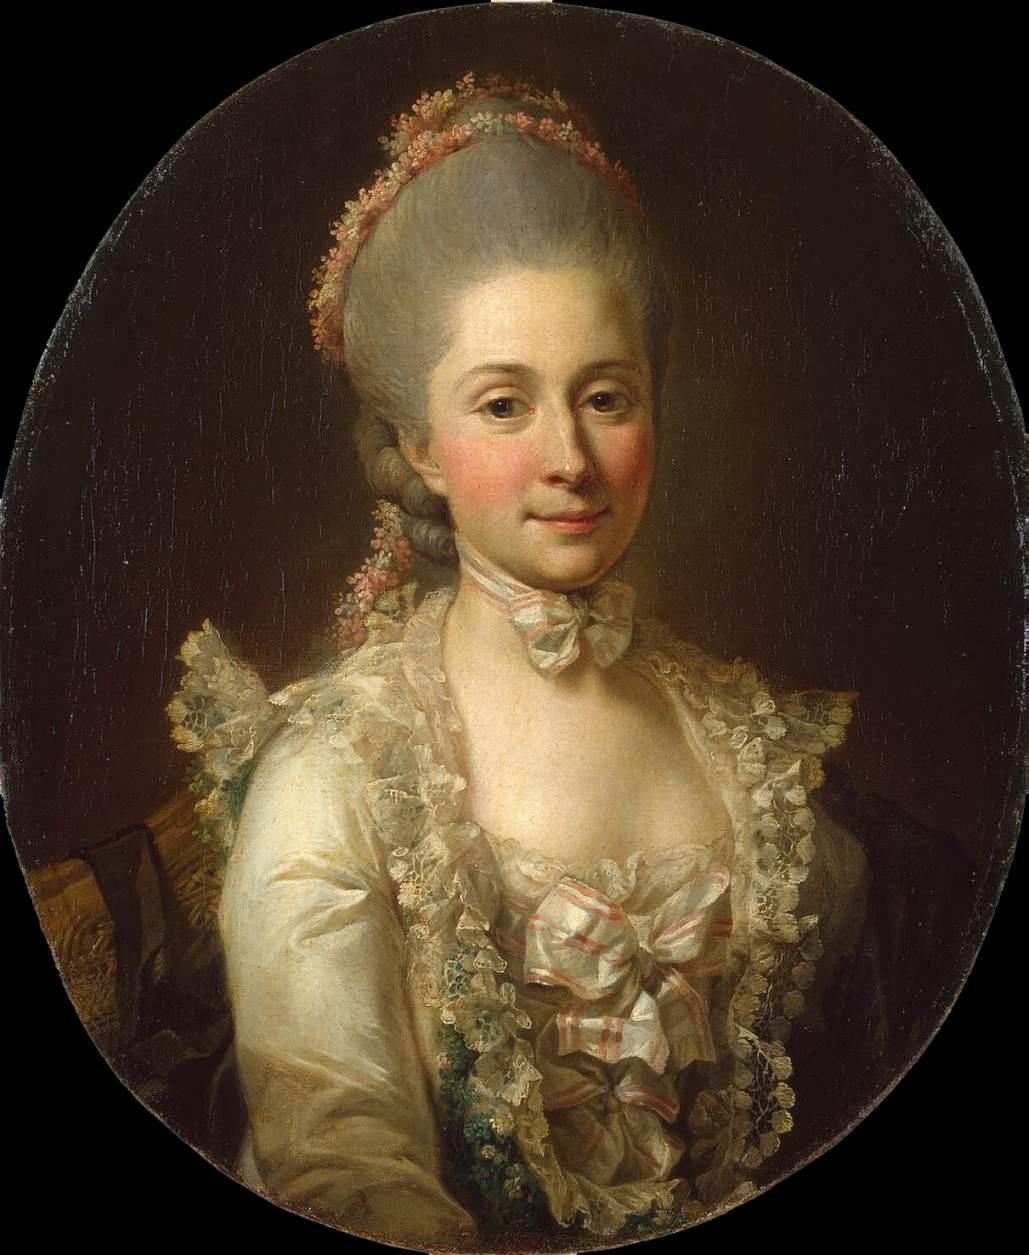 18th century magpiecostumer s blog wga hu art j juel port wom jpg